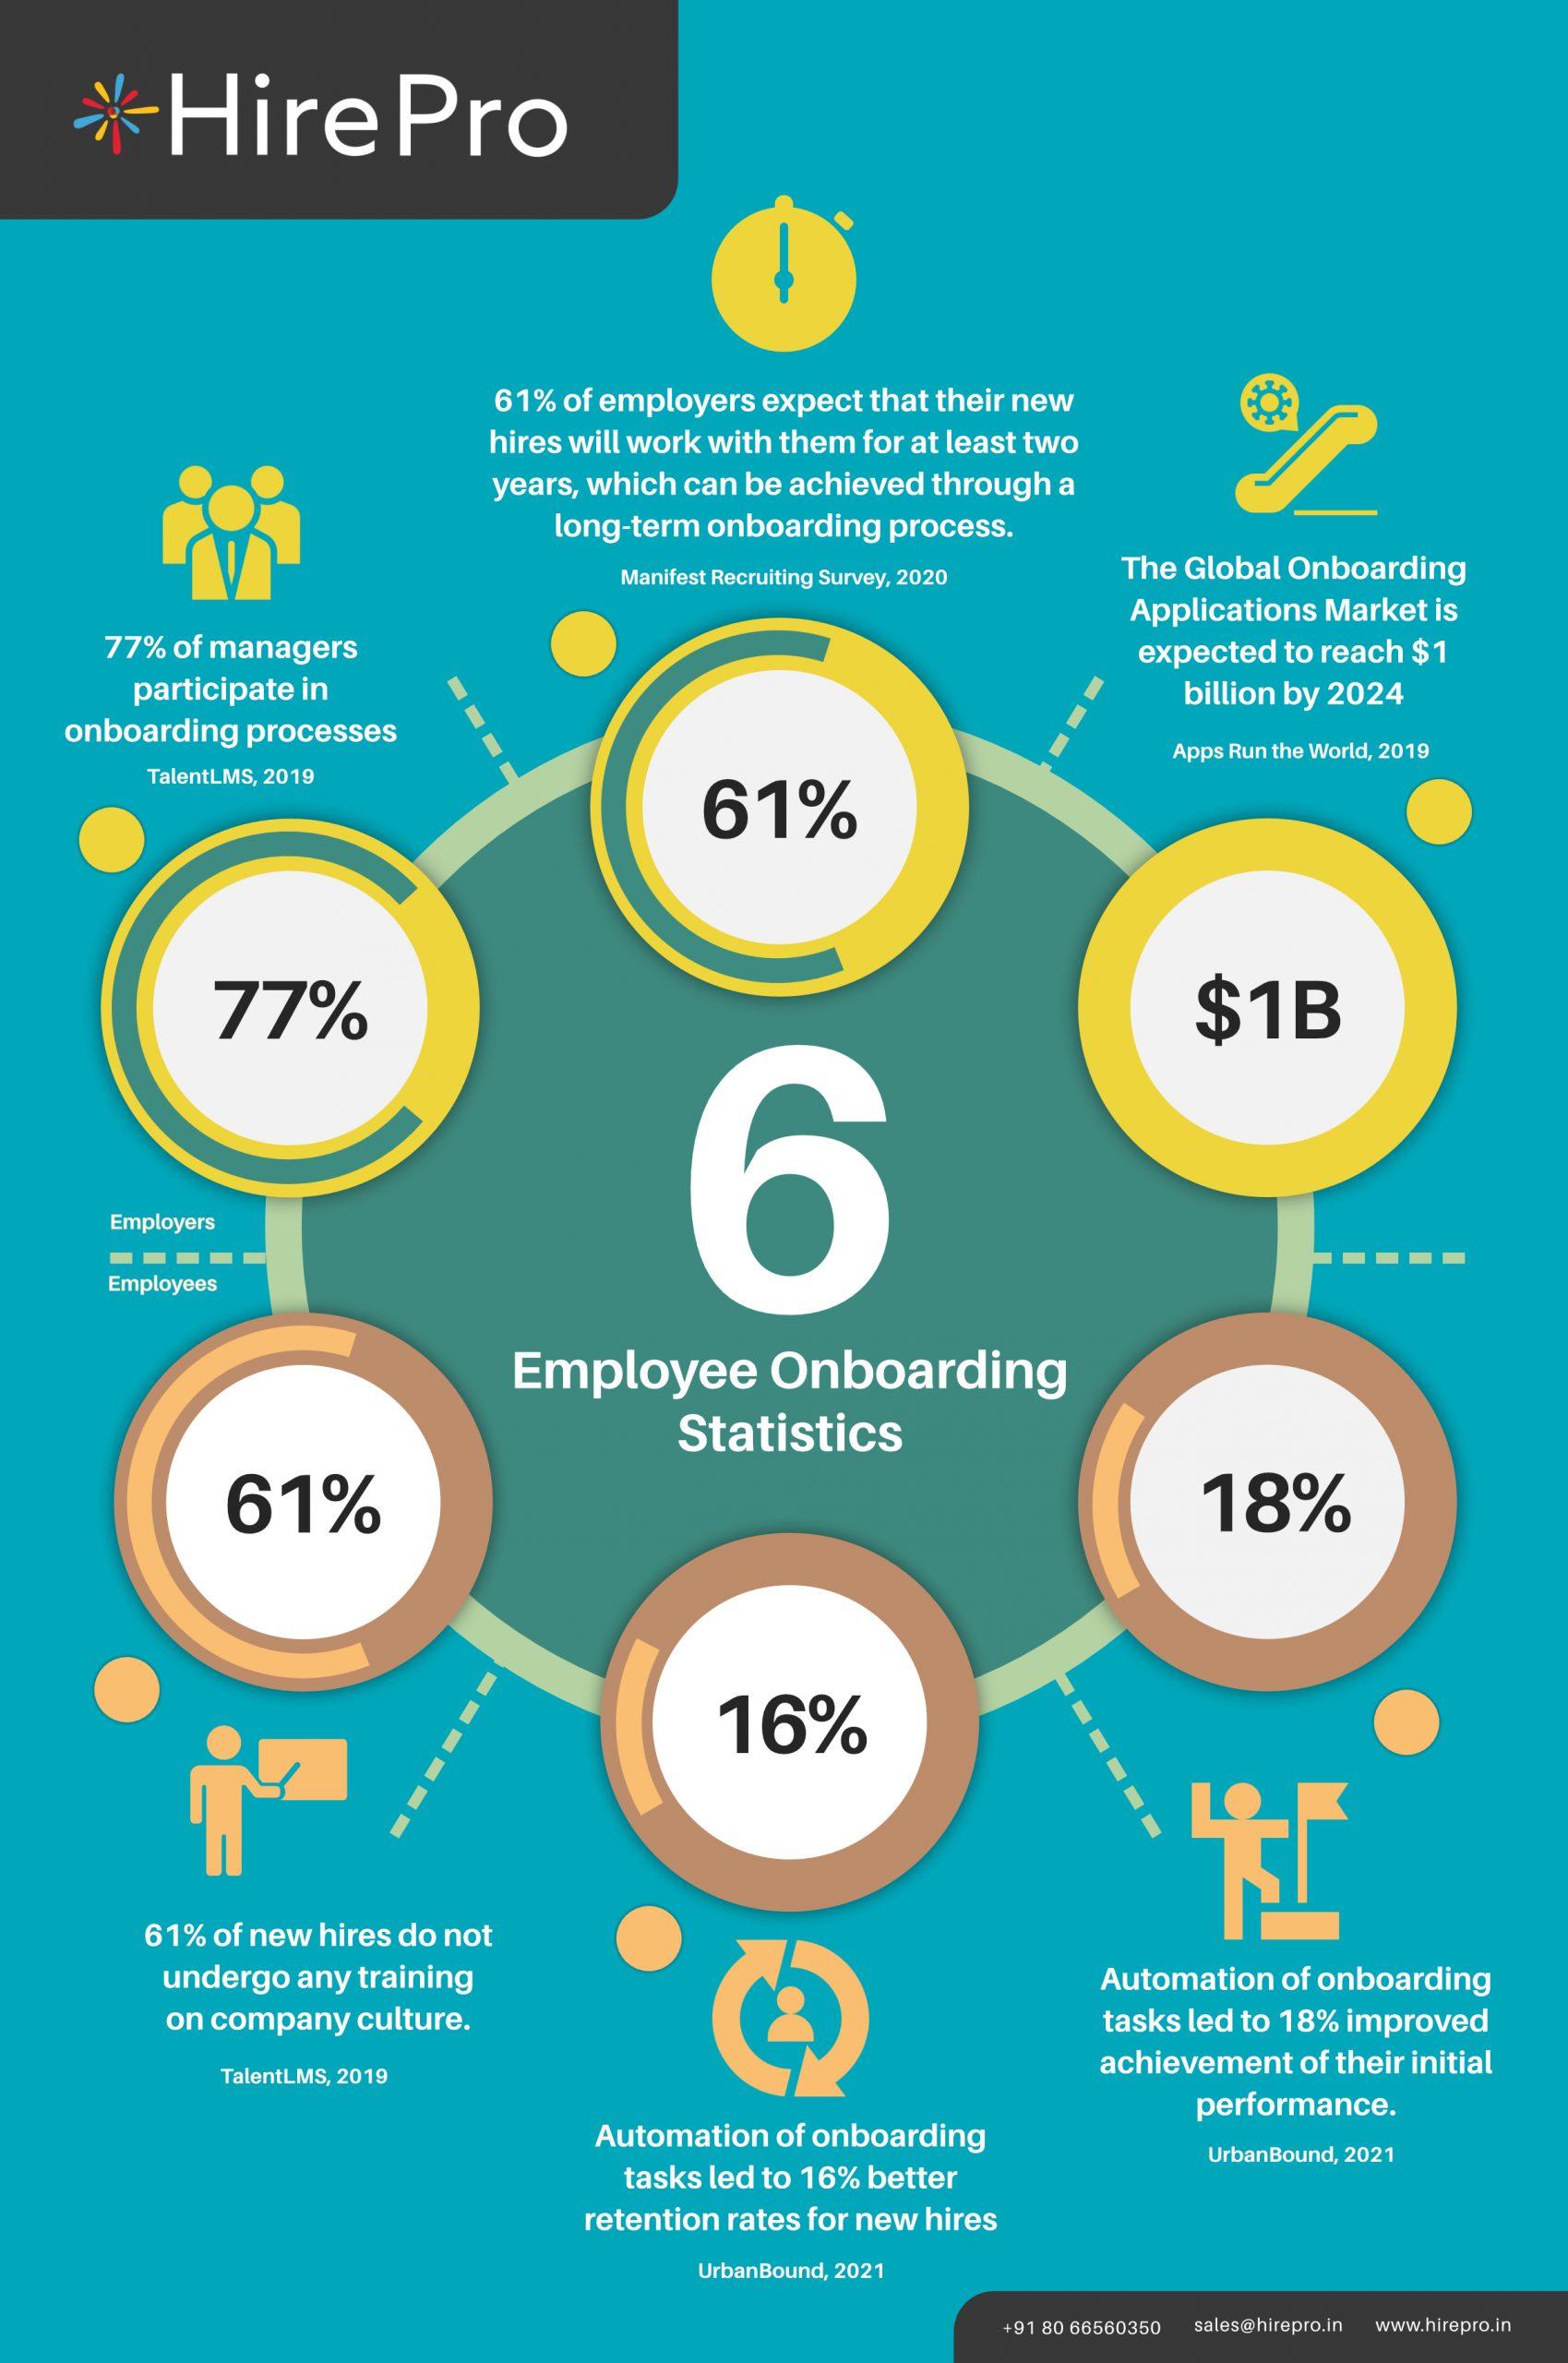 6 Employee Onboarding Statistics